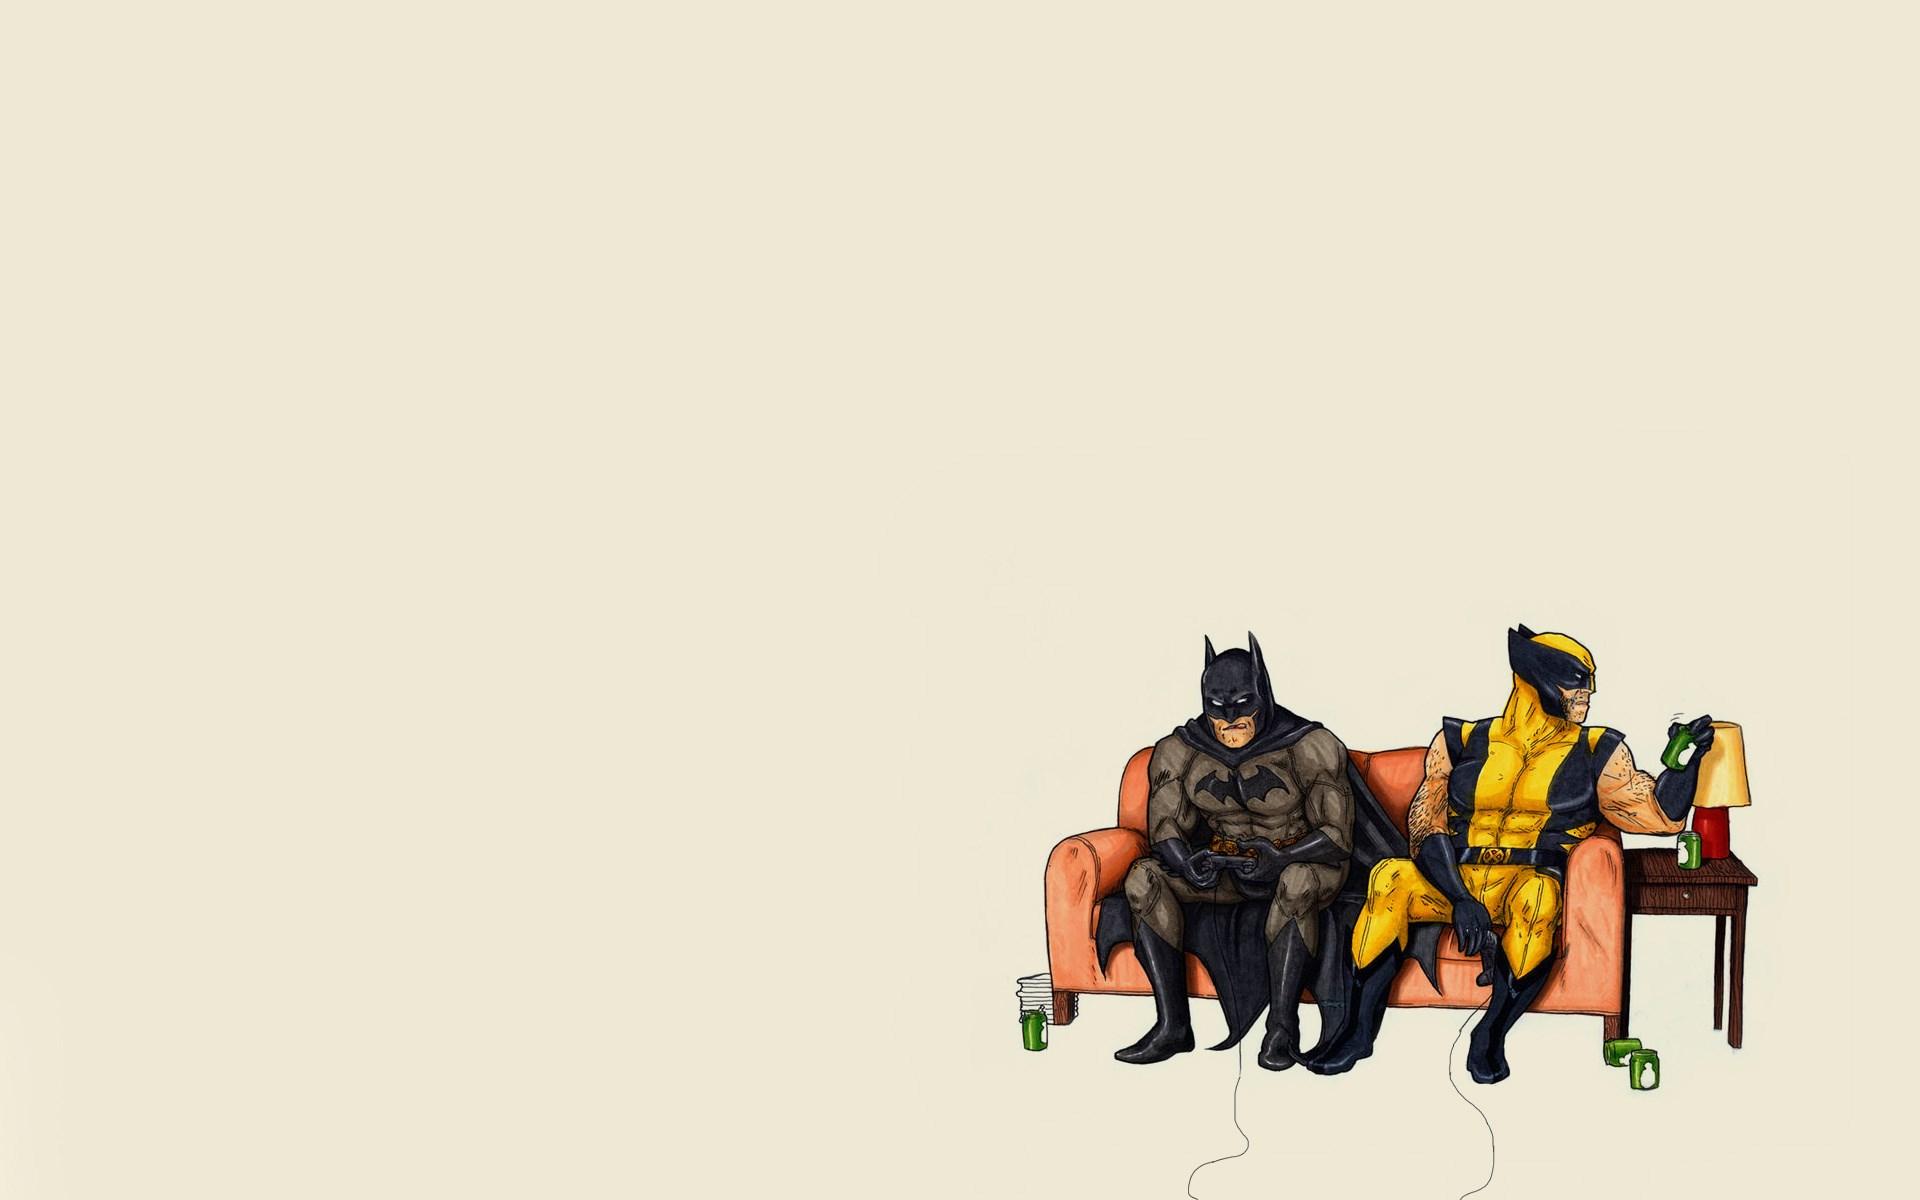 Batman Wolverine Minimalism Art Funny